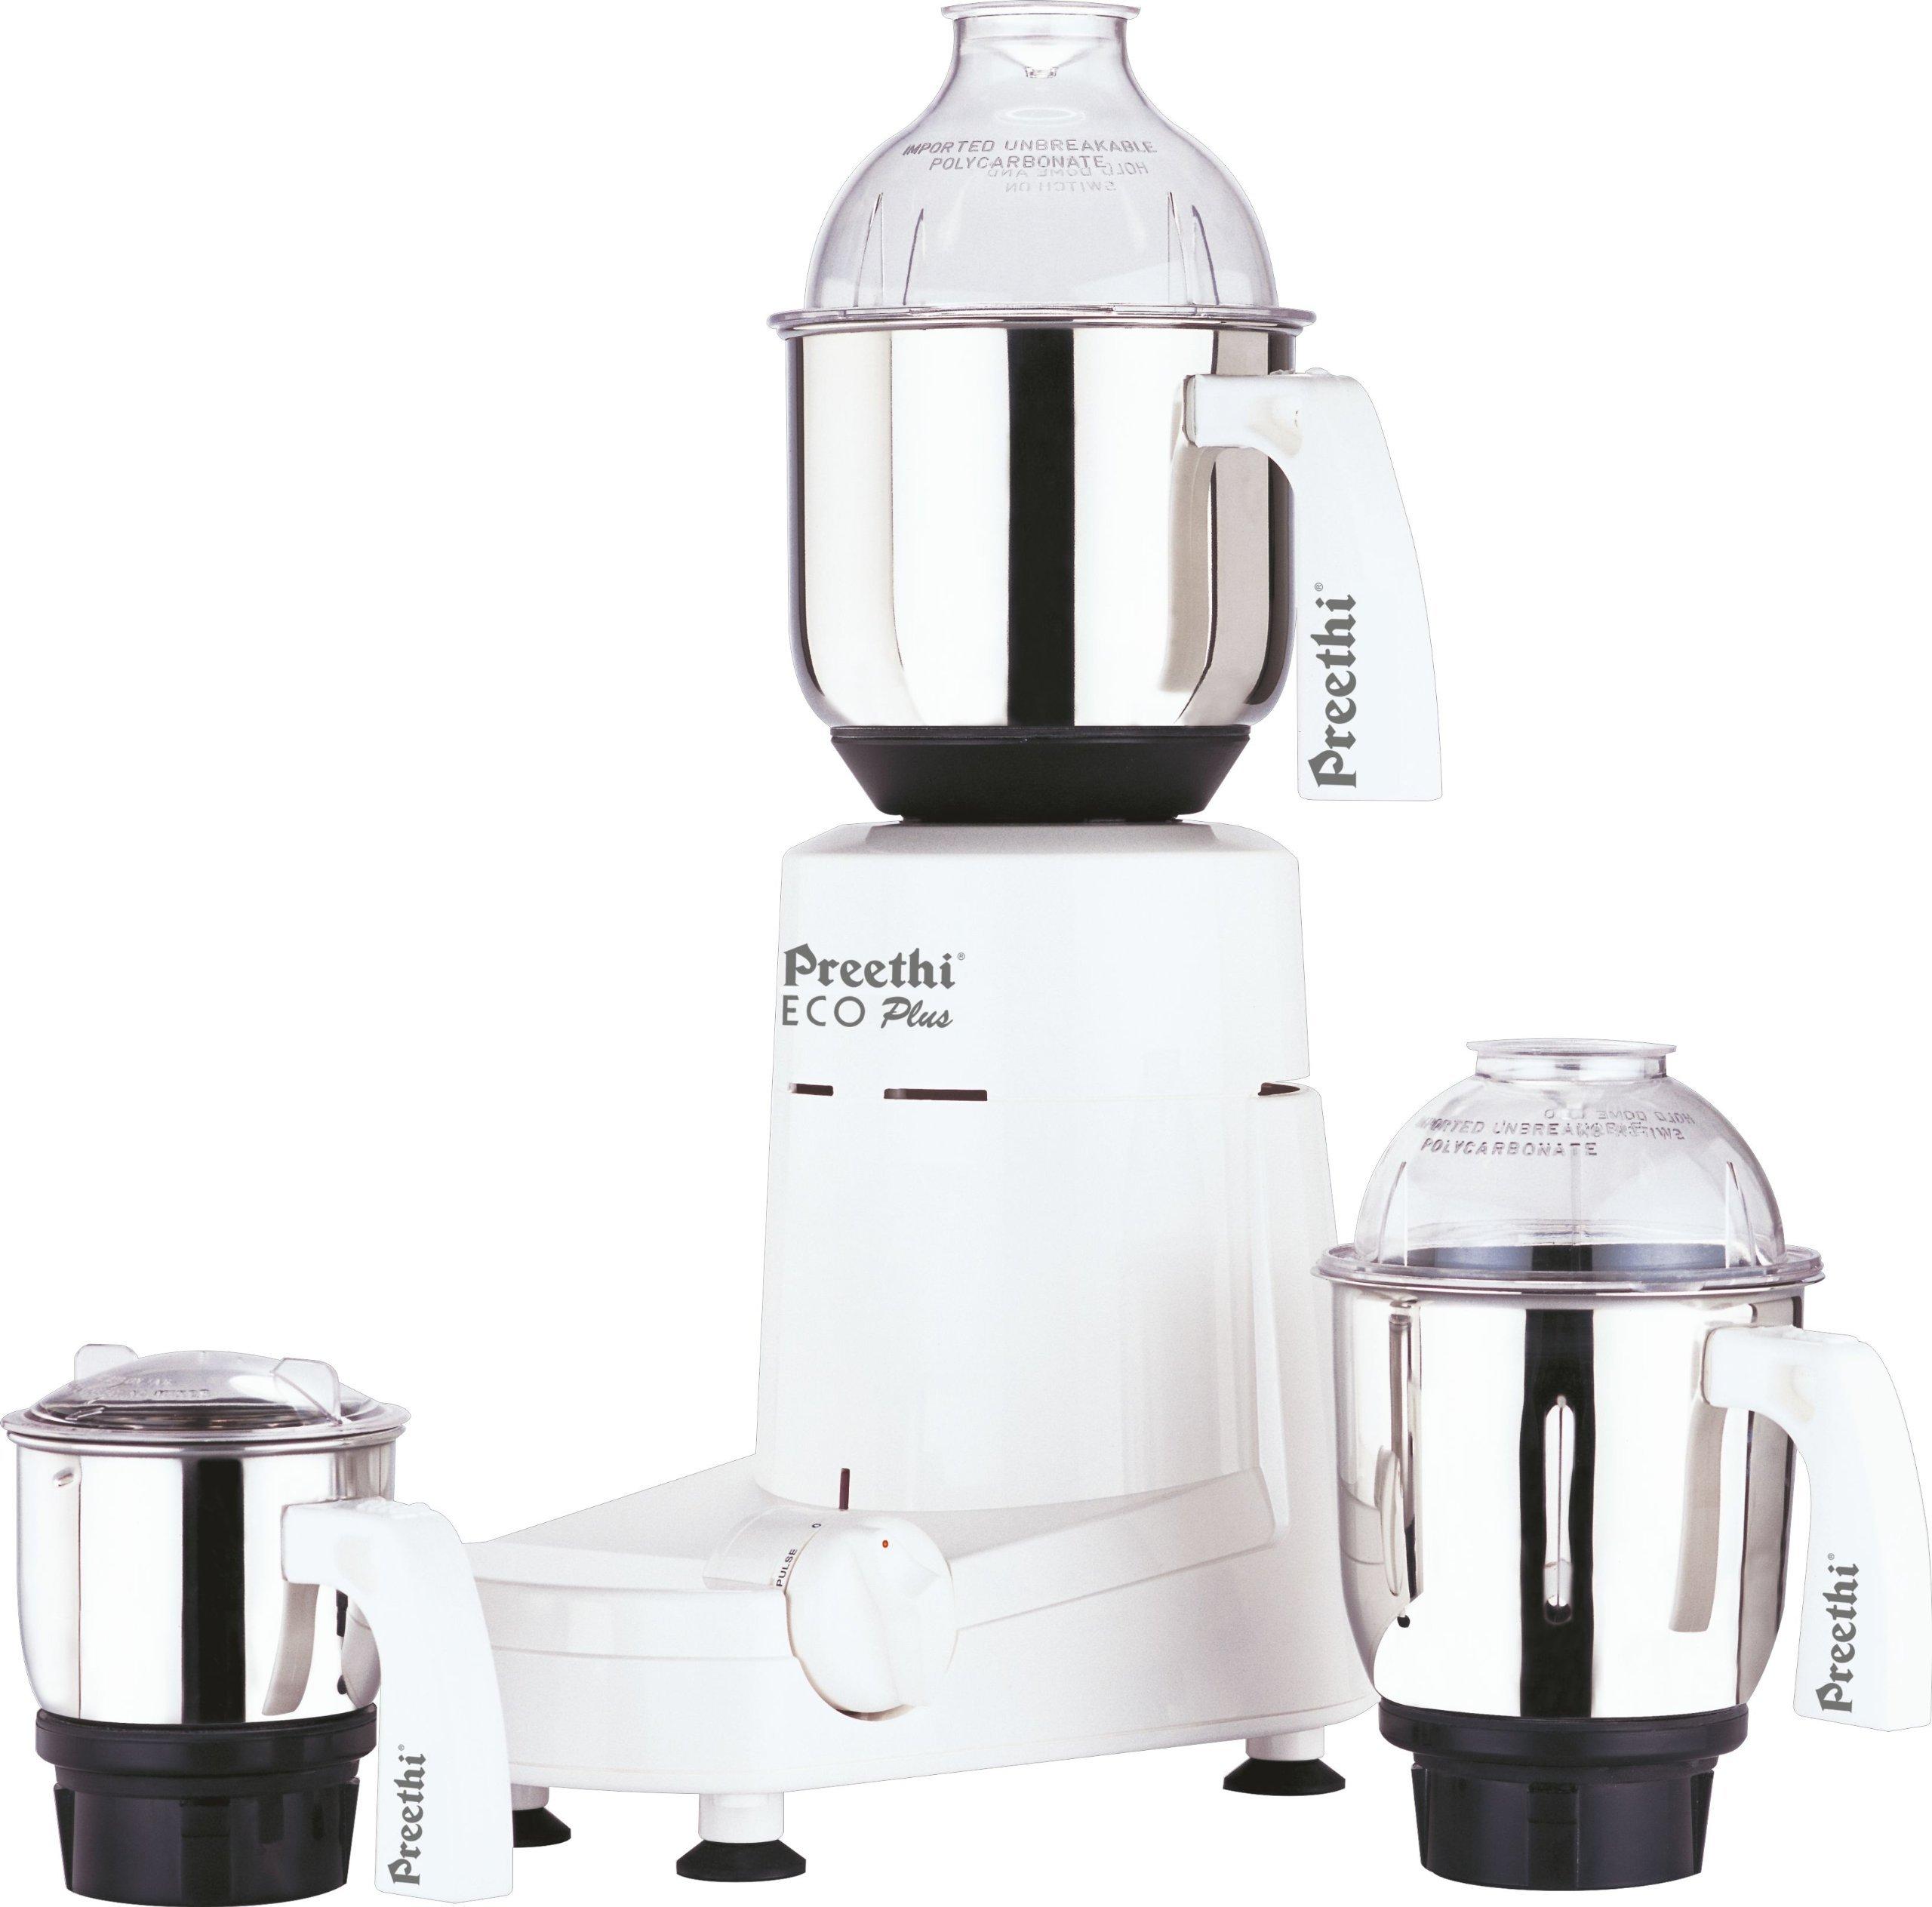 Preethi Eco Plus Mixer Grinder by Preethi